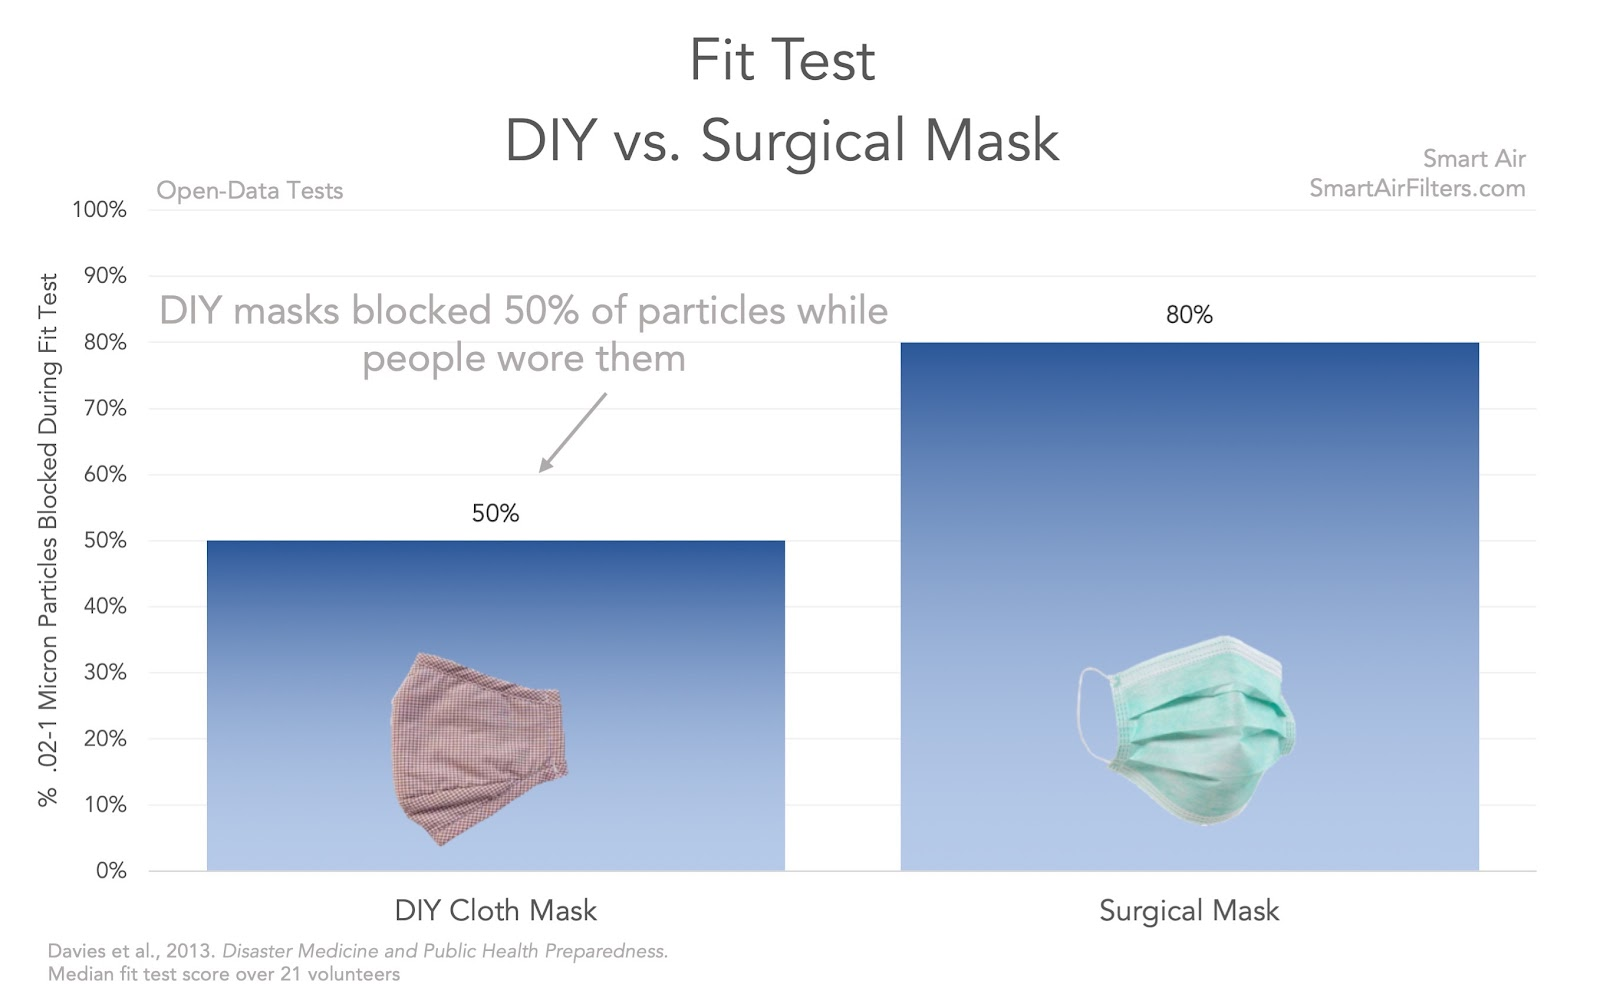 DIY Mask Fit Test Effectiveness Virus